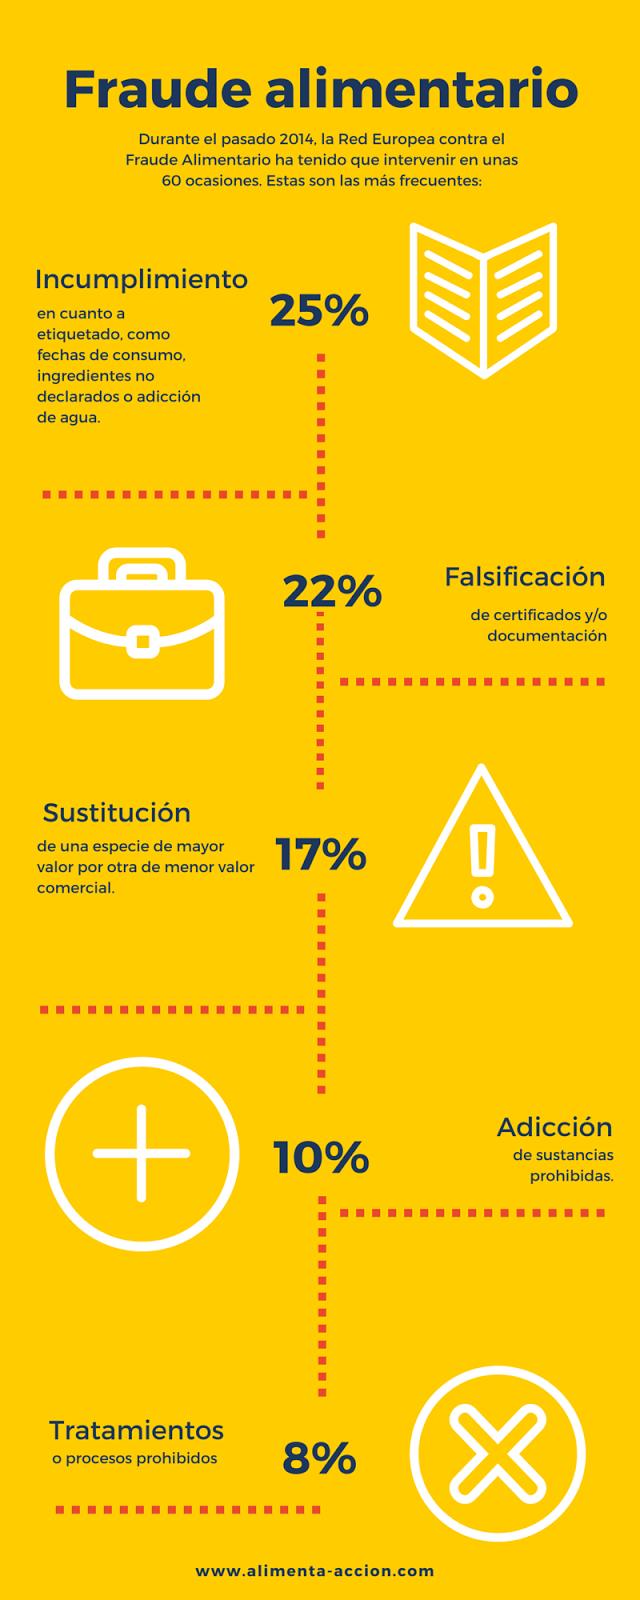 Infografía, fraude alimentario, seguridad alimentaria